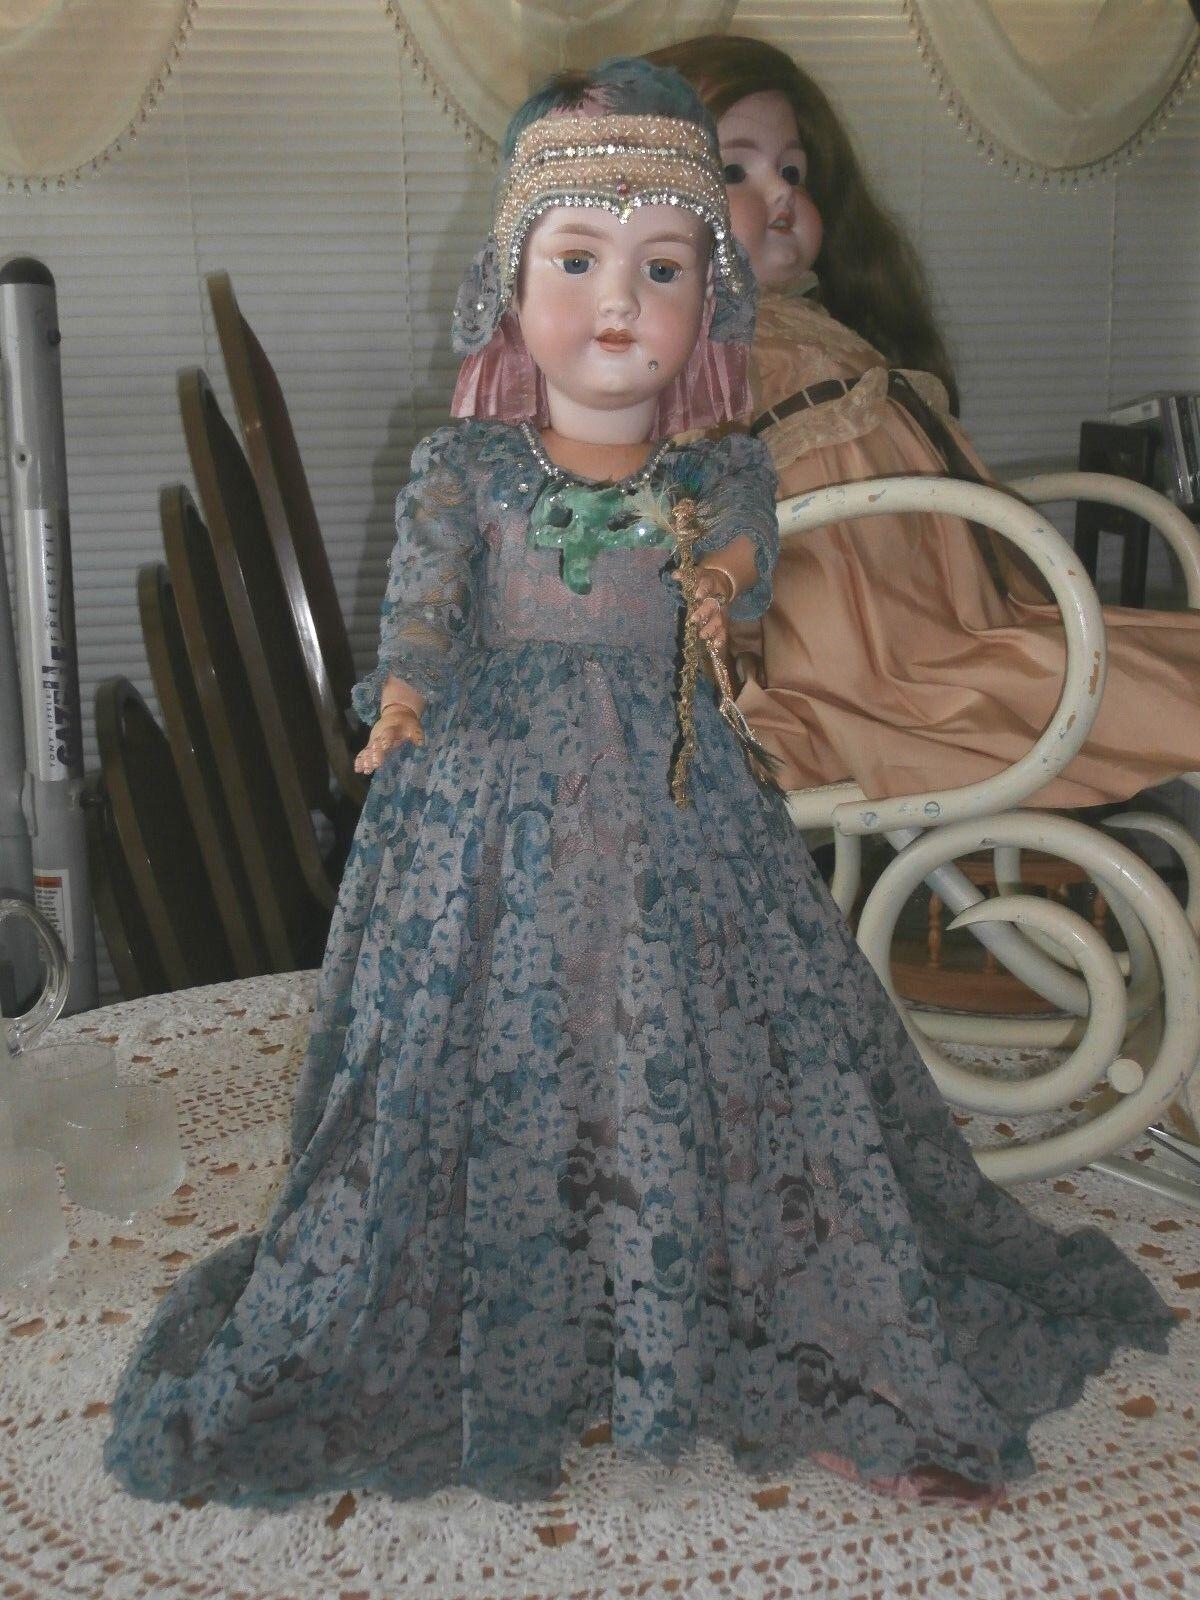 Antigua Muñeca Alemana Armand Marseille Mascarada 390n cabeza de Biscuit Compo cuerpo 24